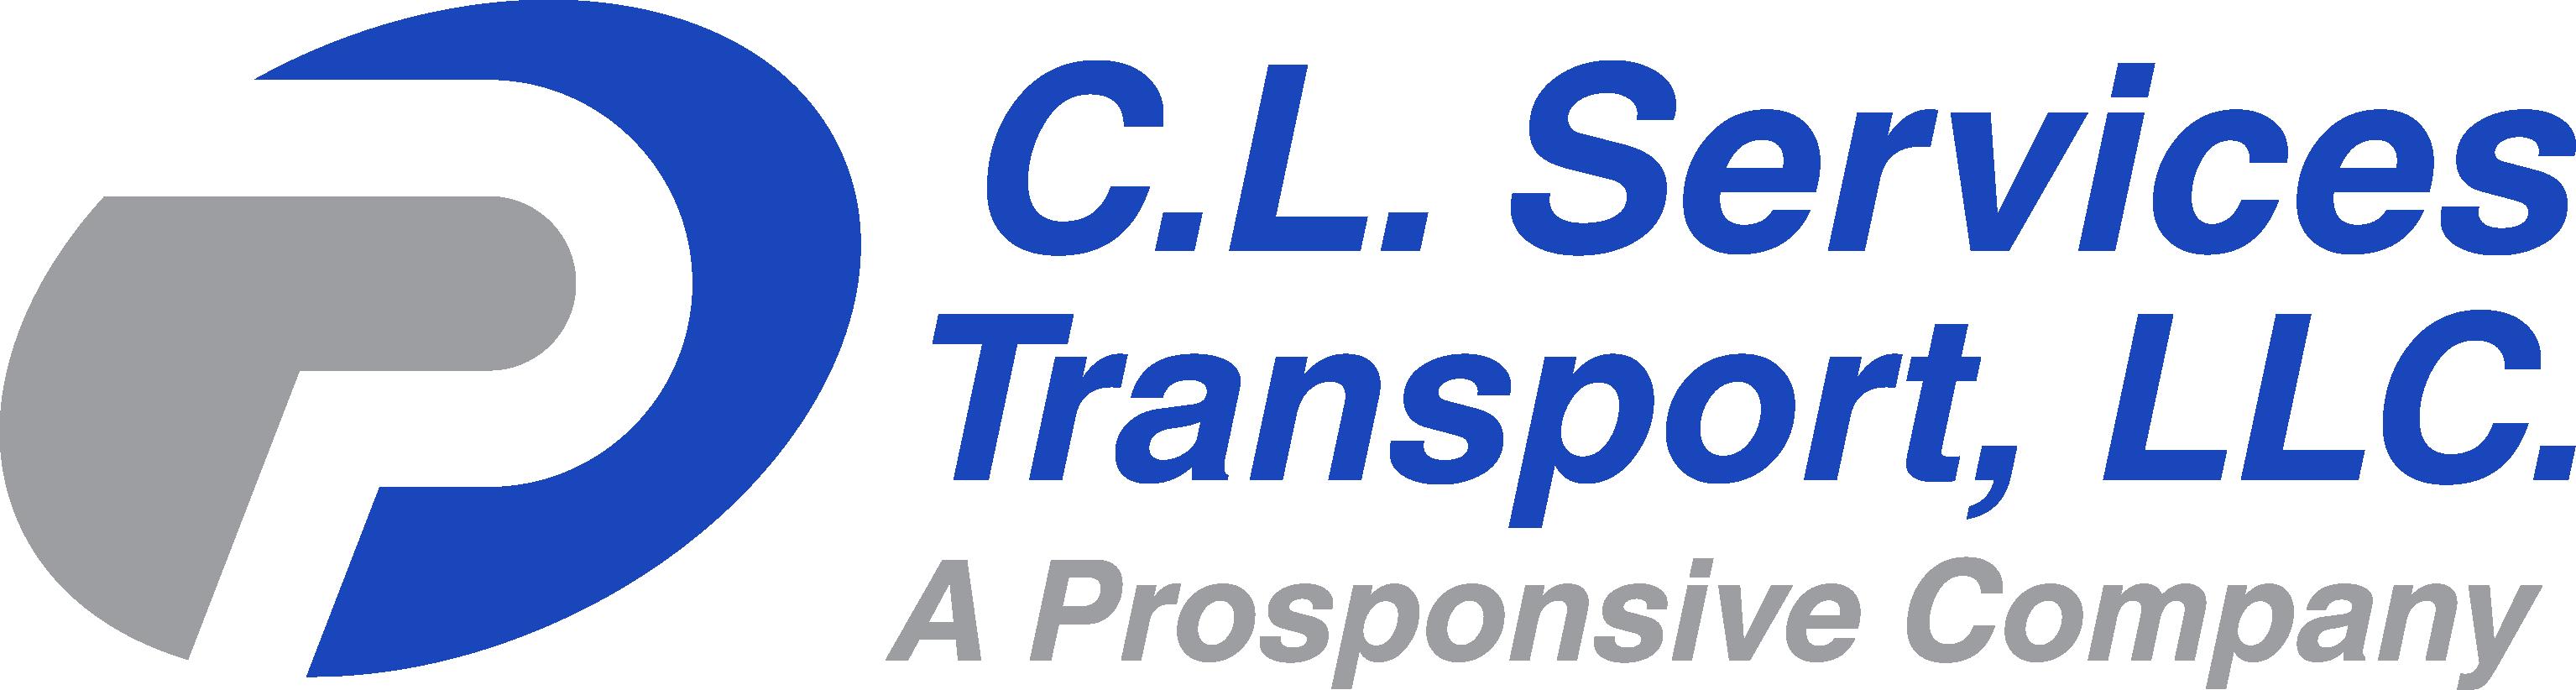 C.L.-Services-Transport_logo_02